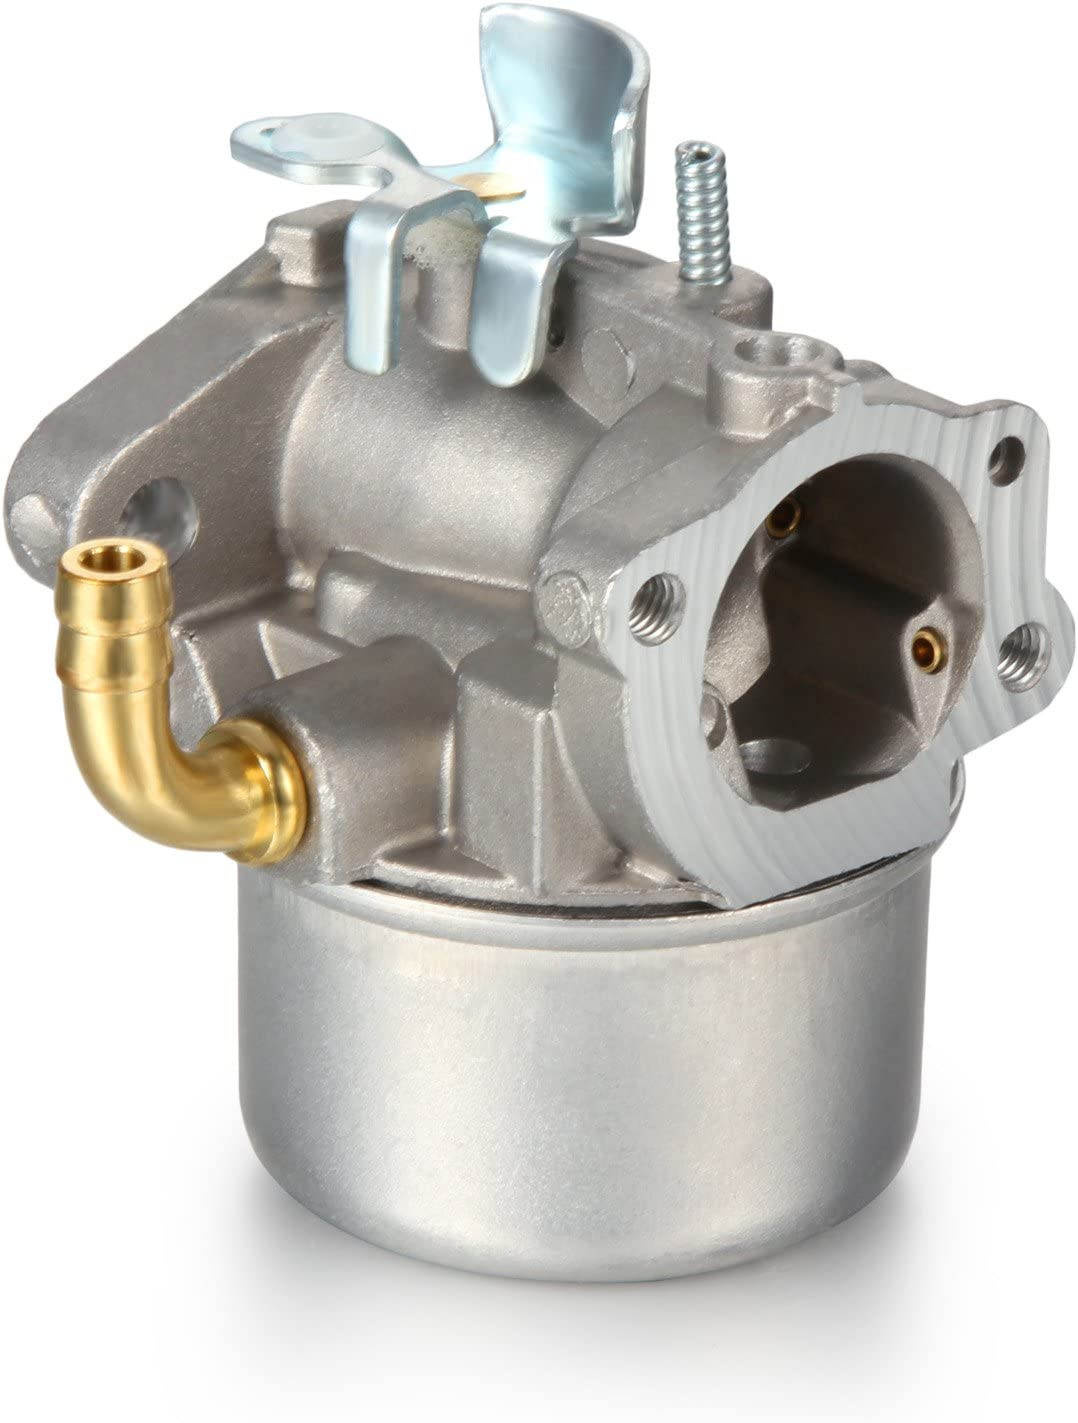 Dromedary Carburetor Fits for Briggs Stratton Craftsman Tiller Intek 791077 696981 698860 790182